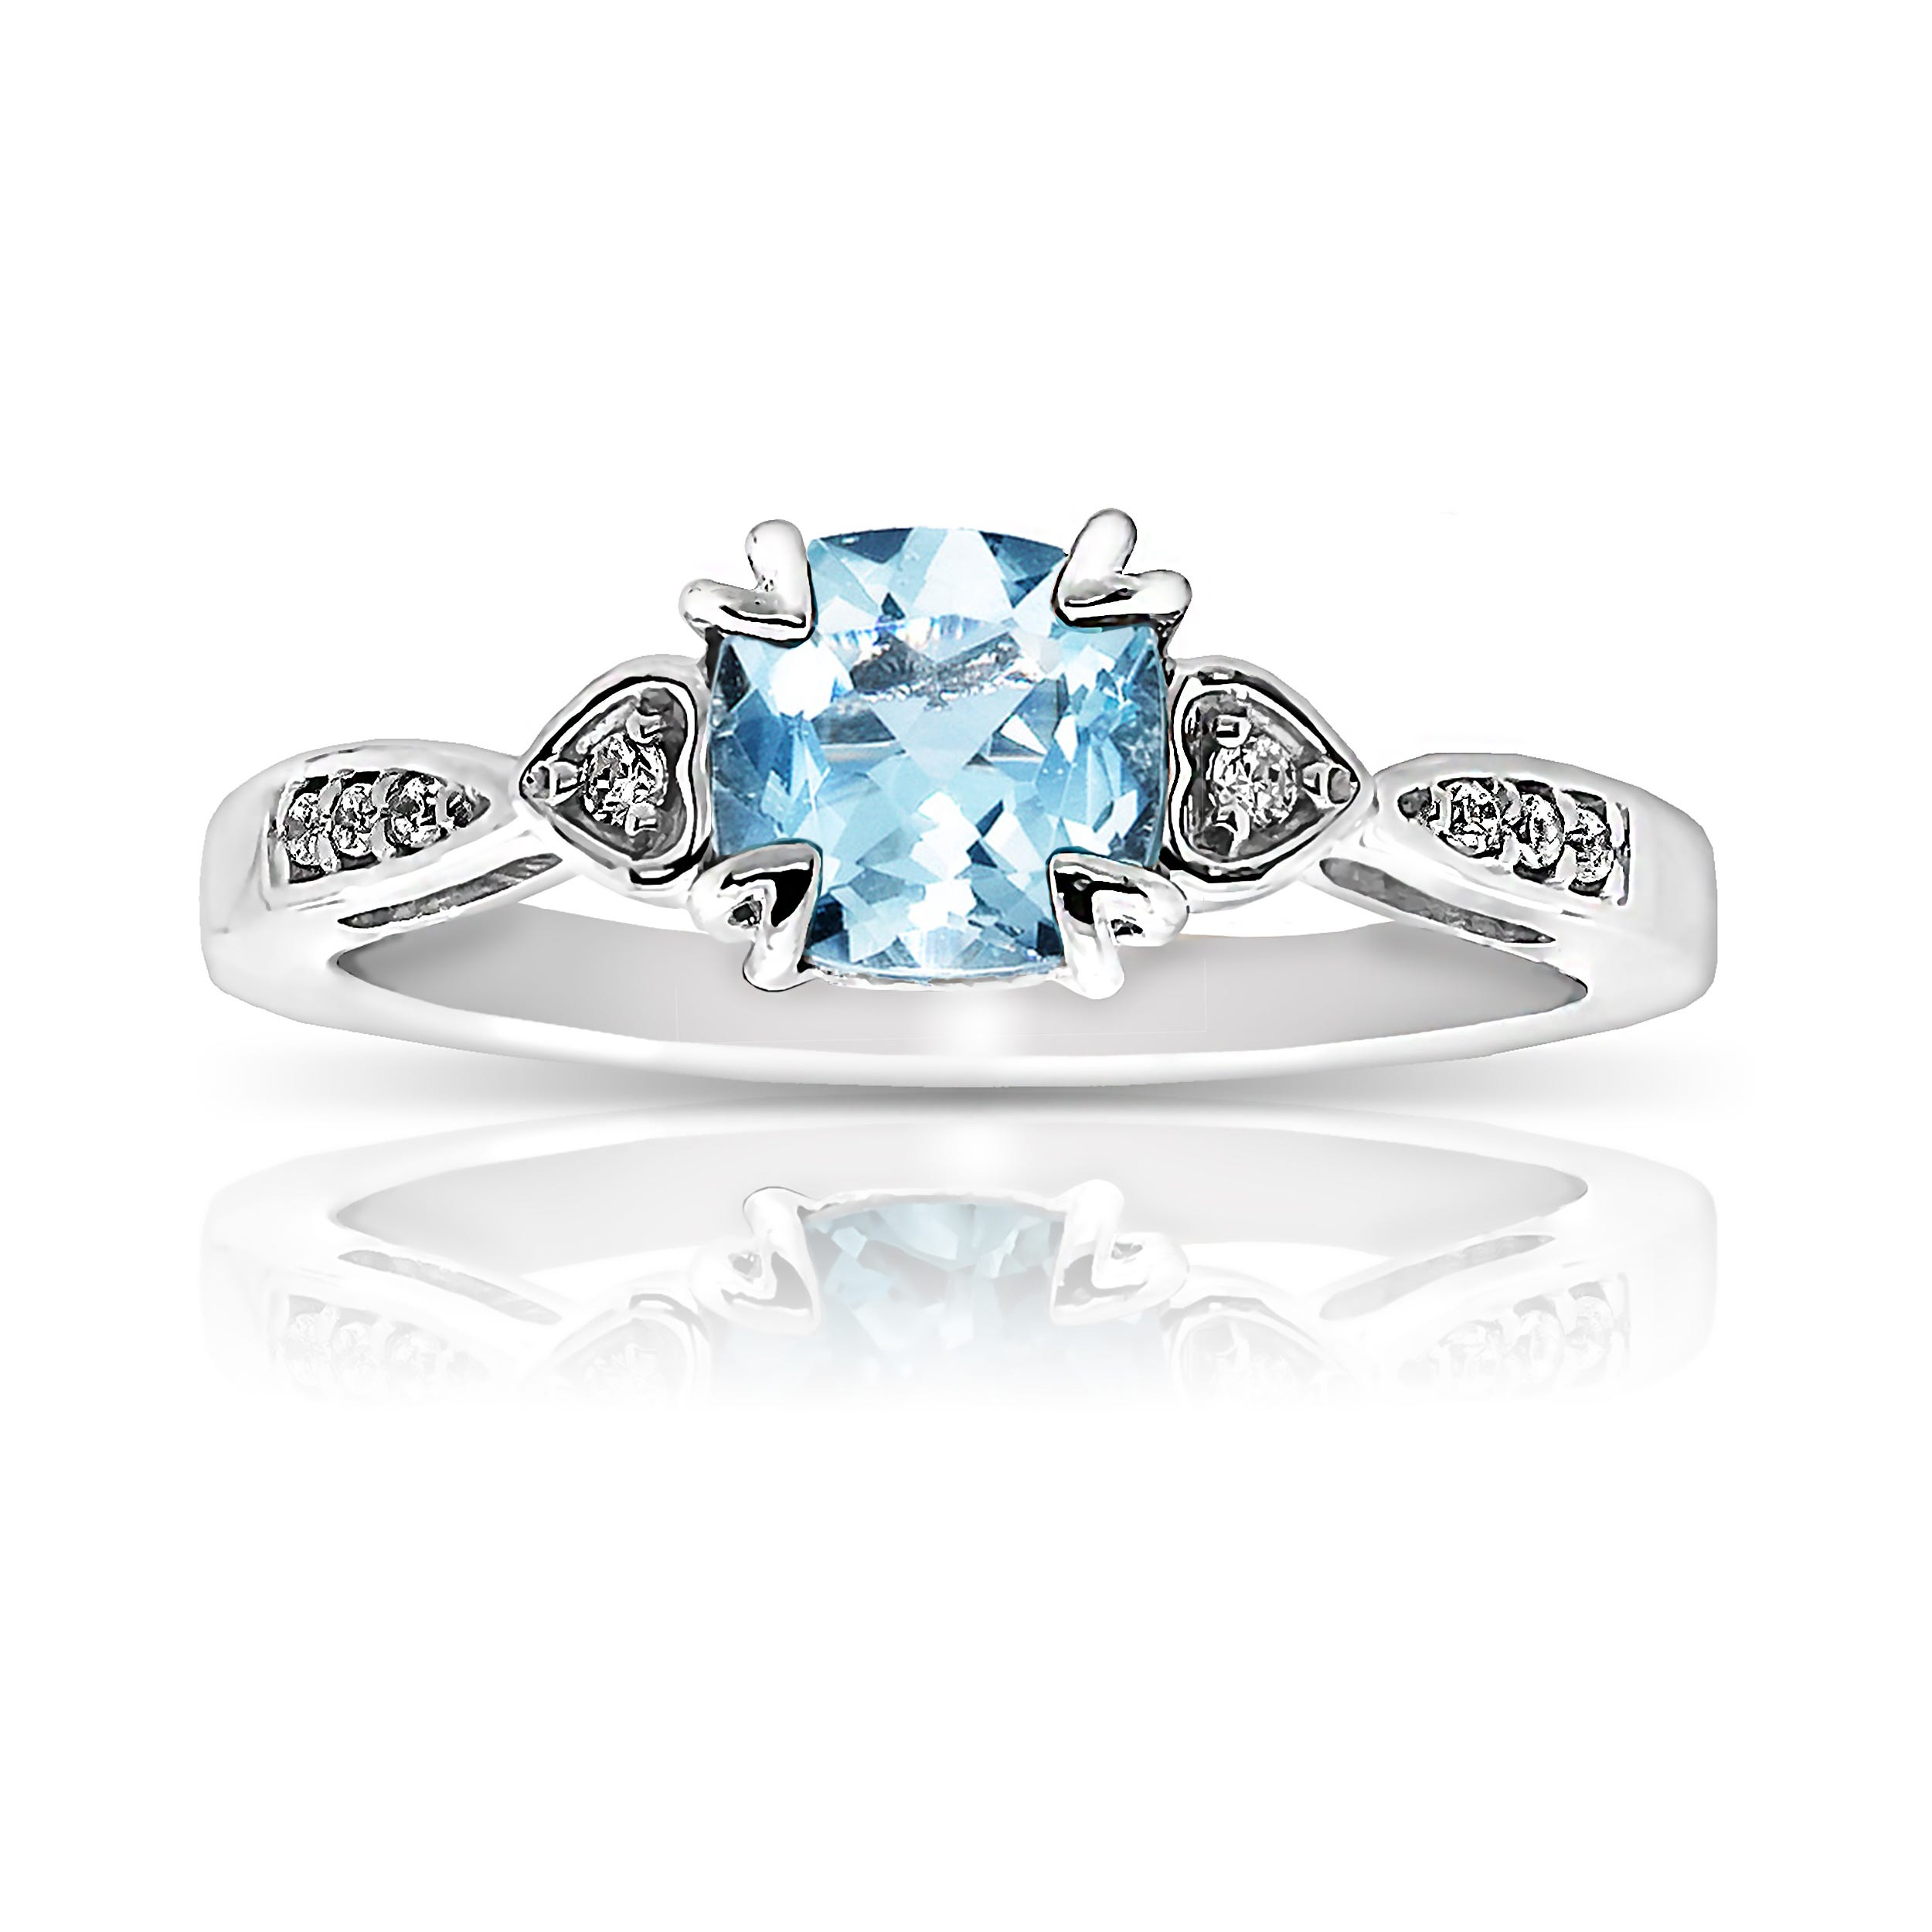 Aquamarine & Diamond Ring in 10k White Gold